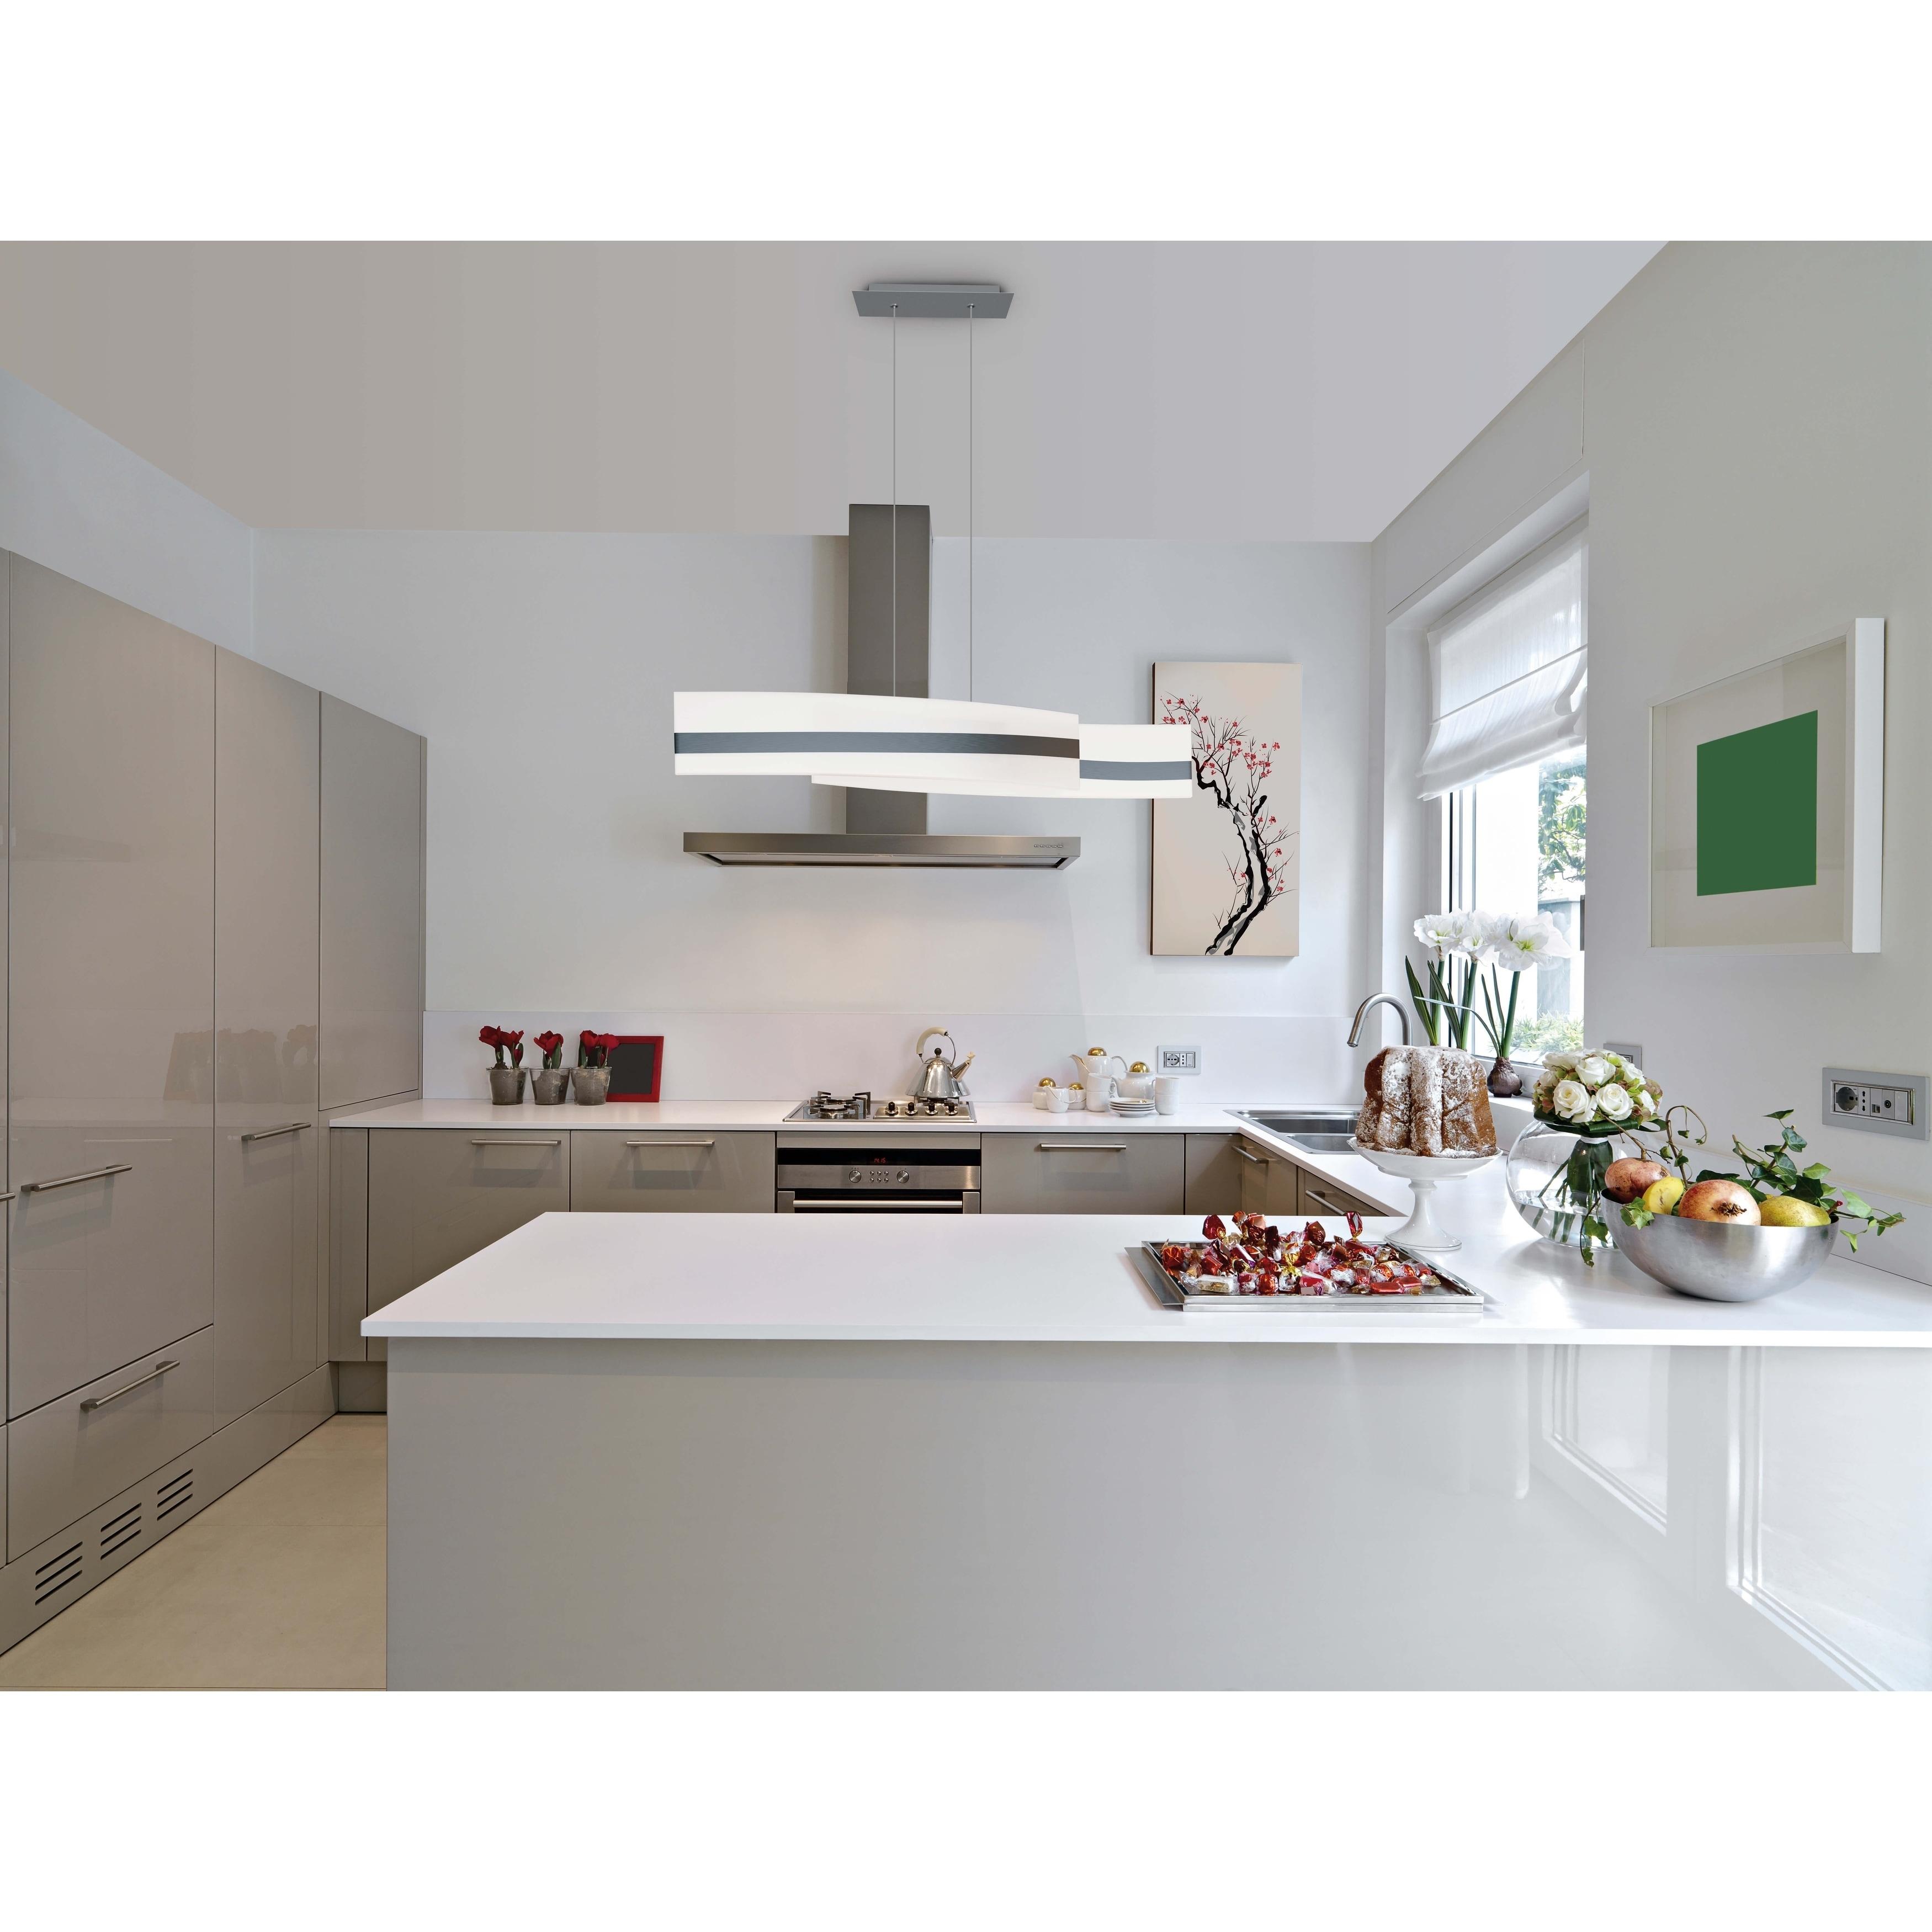 VONN Lighting VHC36600AL 39-inch Metis WiFi-Enabled Tunable White ...